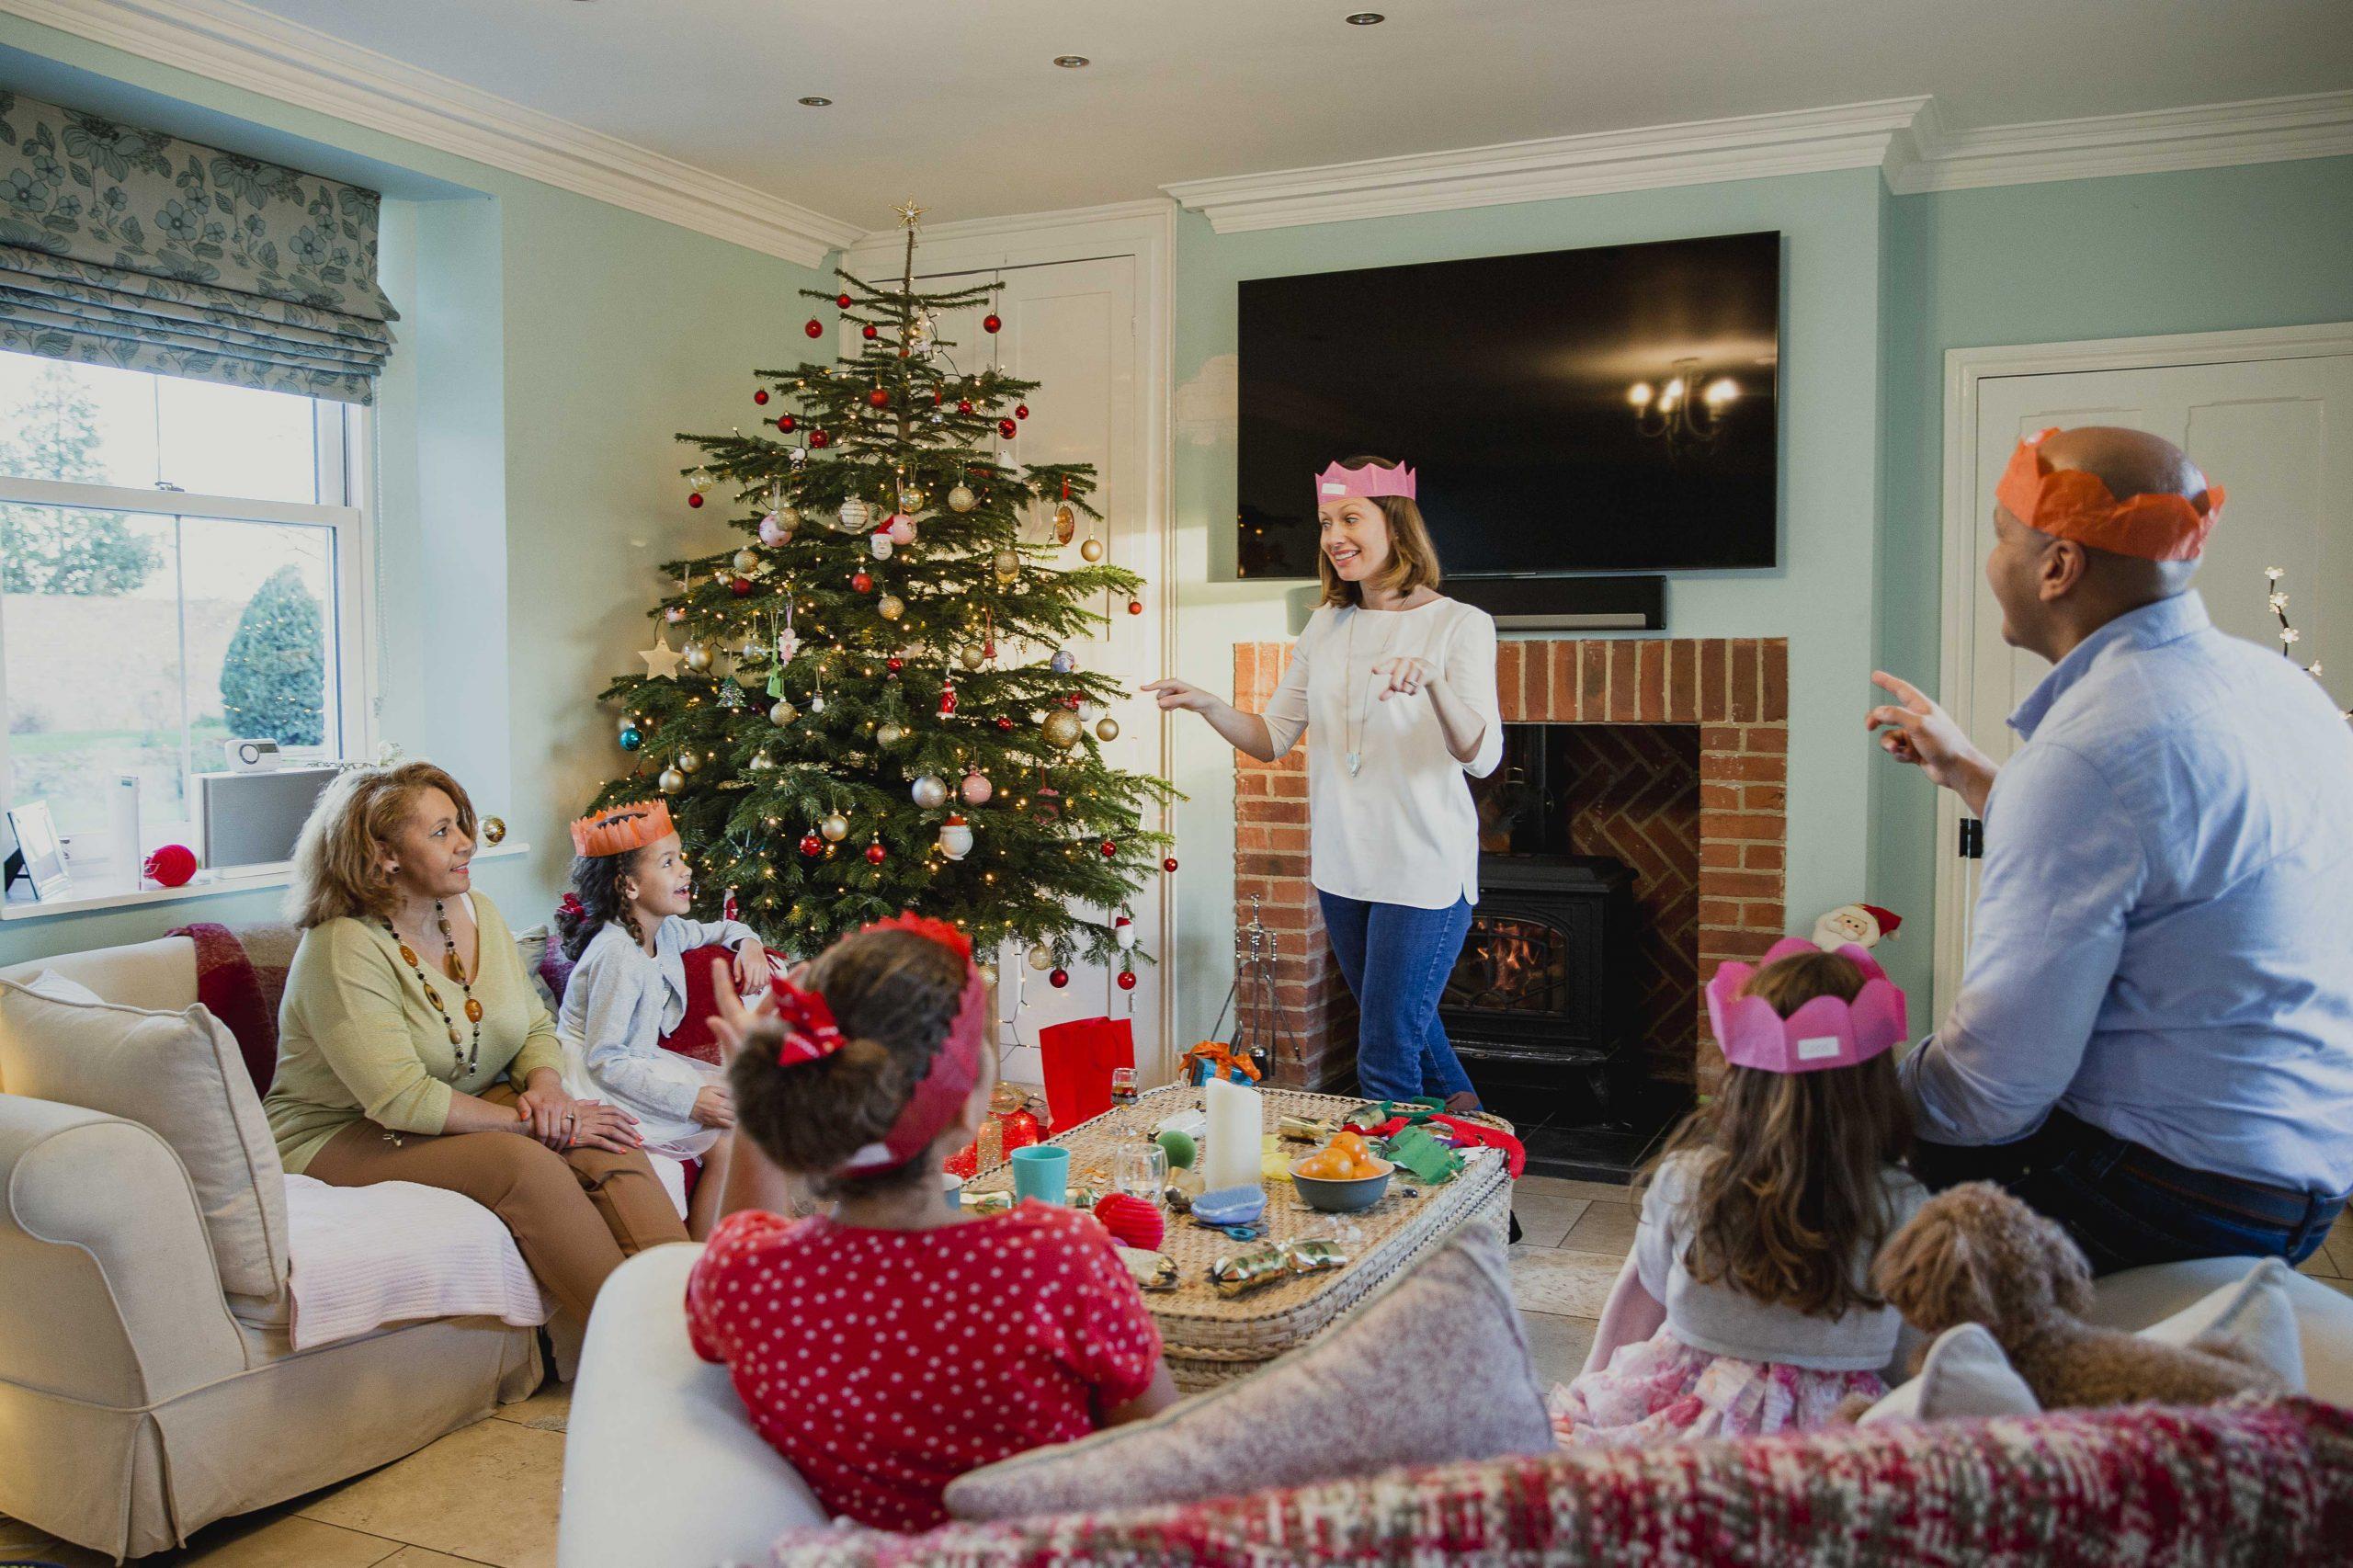 Family playing Christmas games